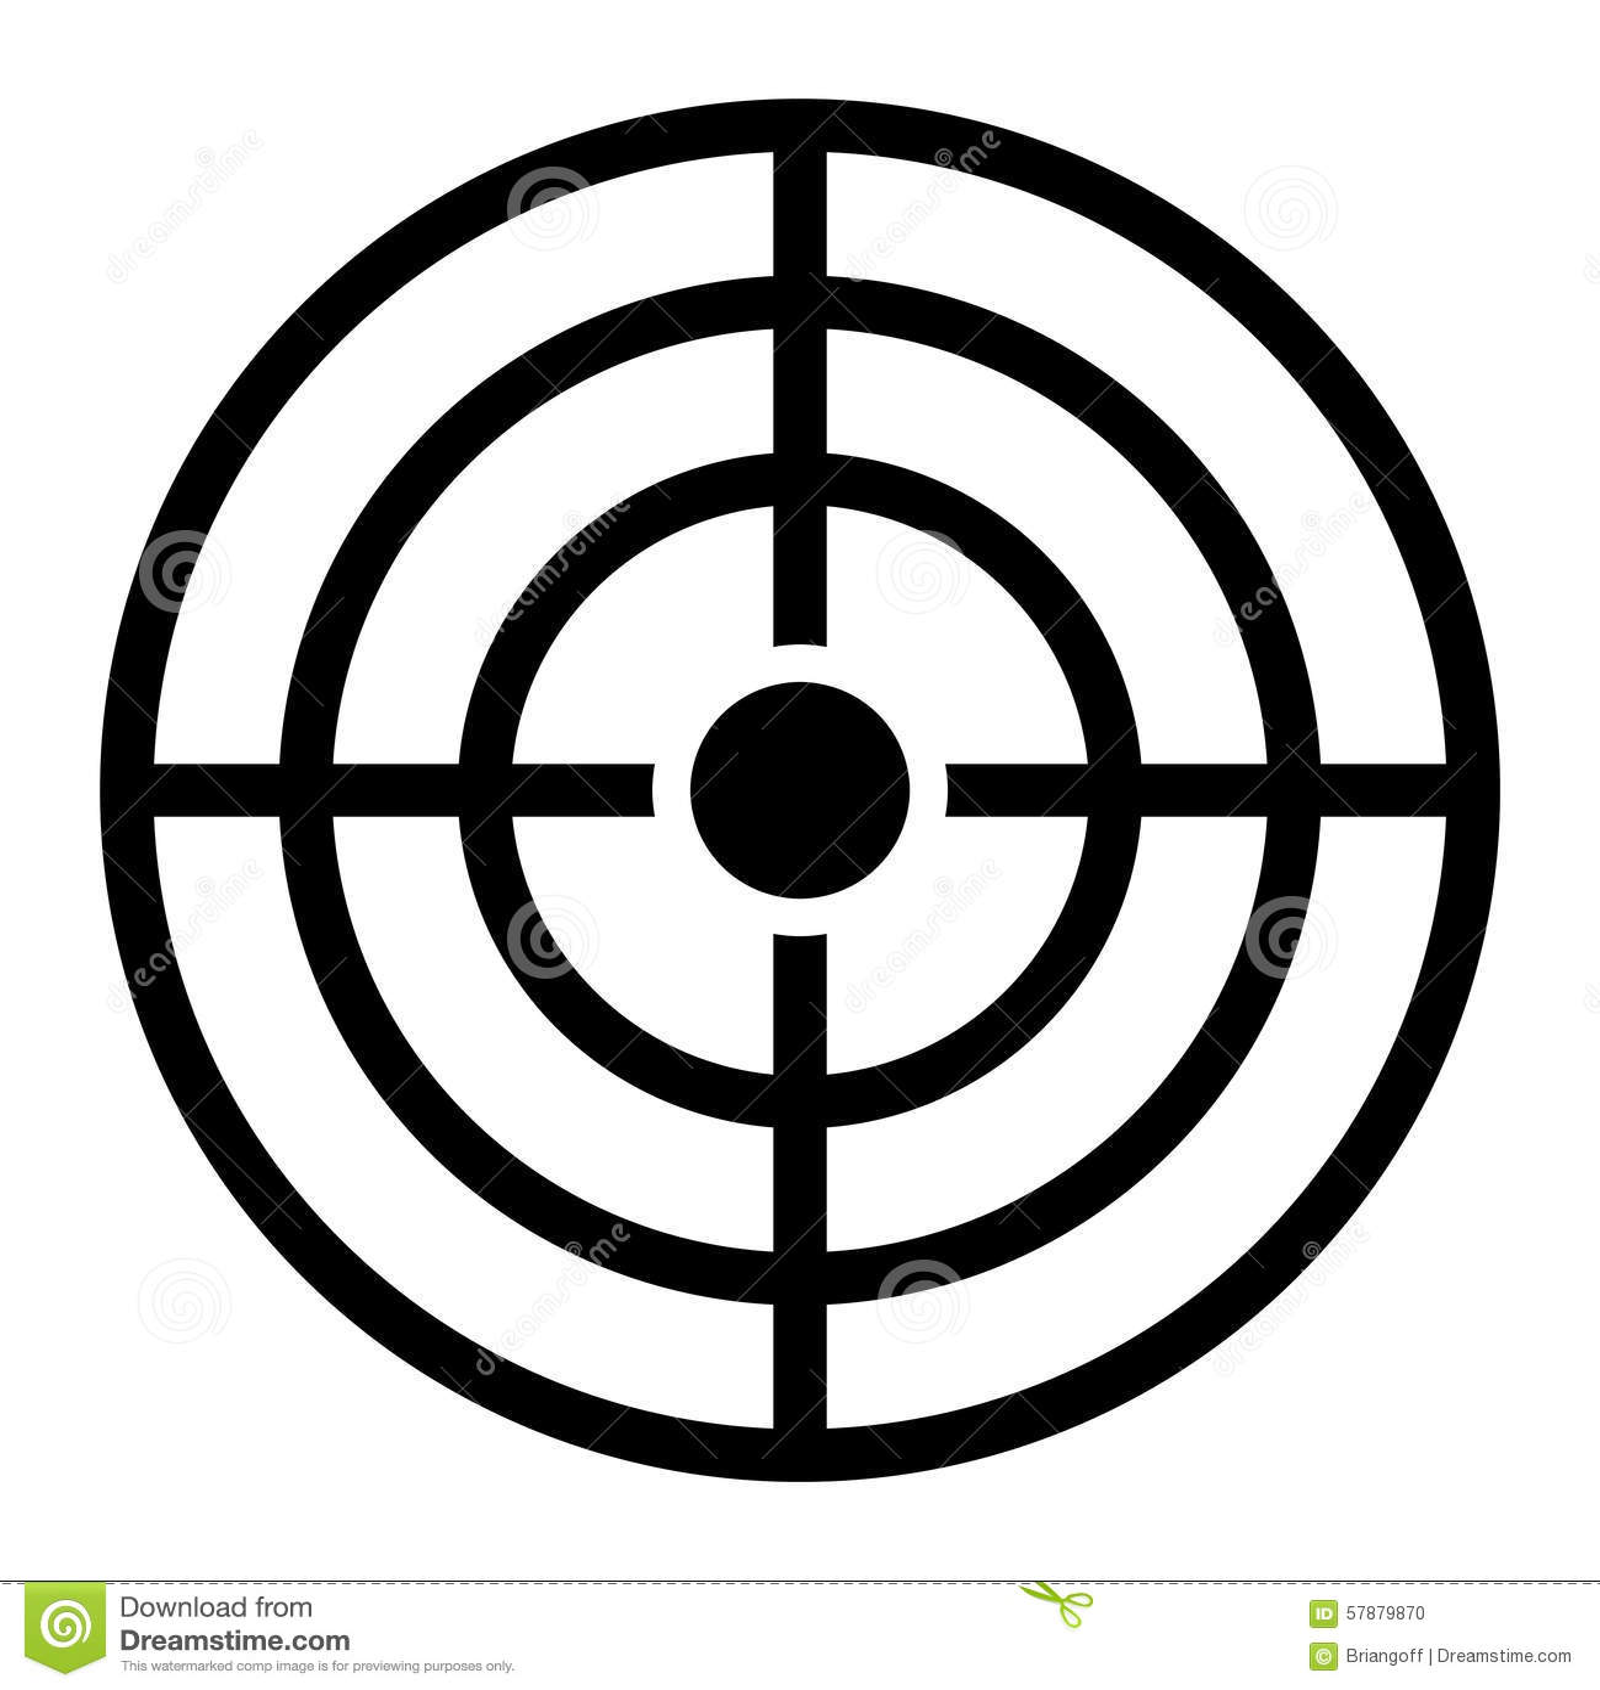 Target Crosshairs Aim stock vector. Illustration of design